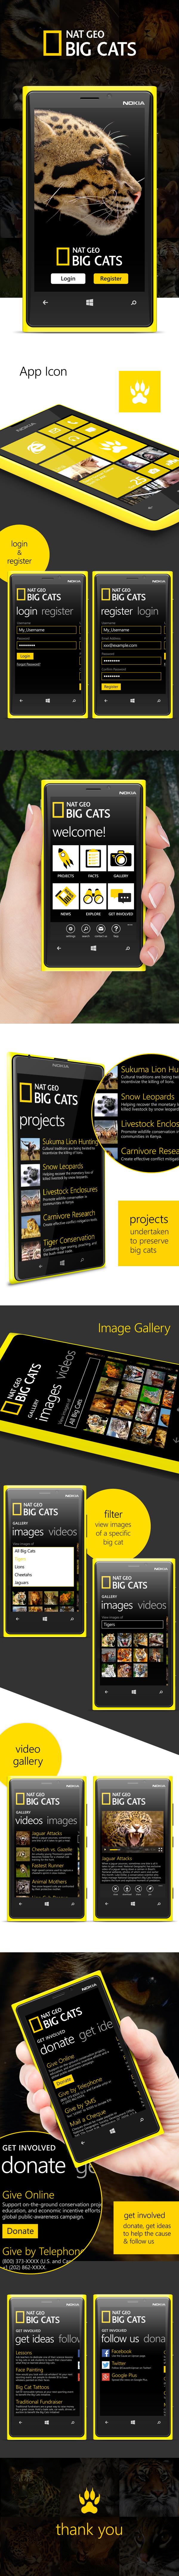 windows app UI ux NATGEO mobile animal wildlife application design Microsoft national geographic big cats Cat wild